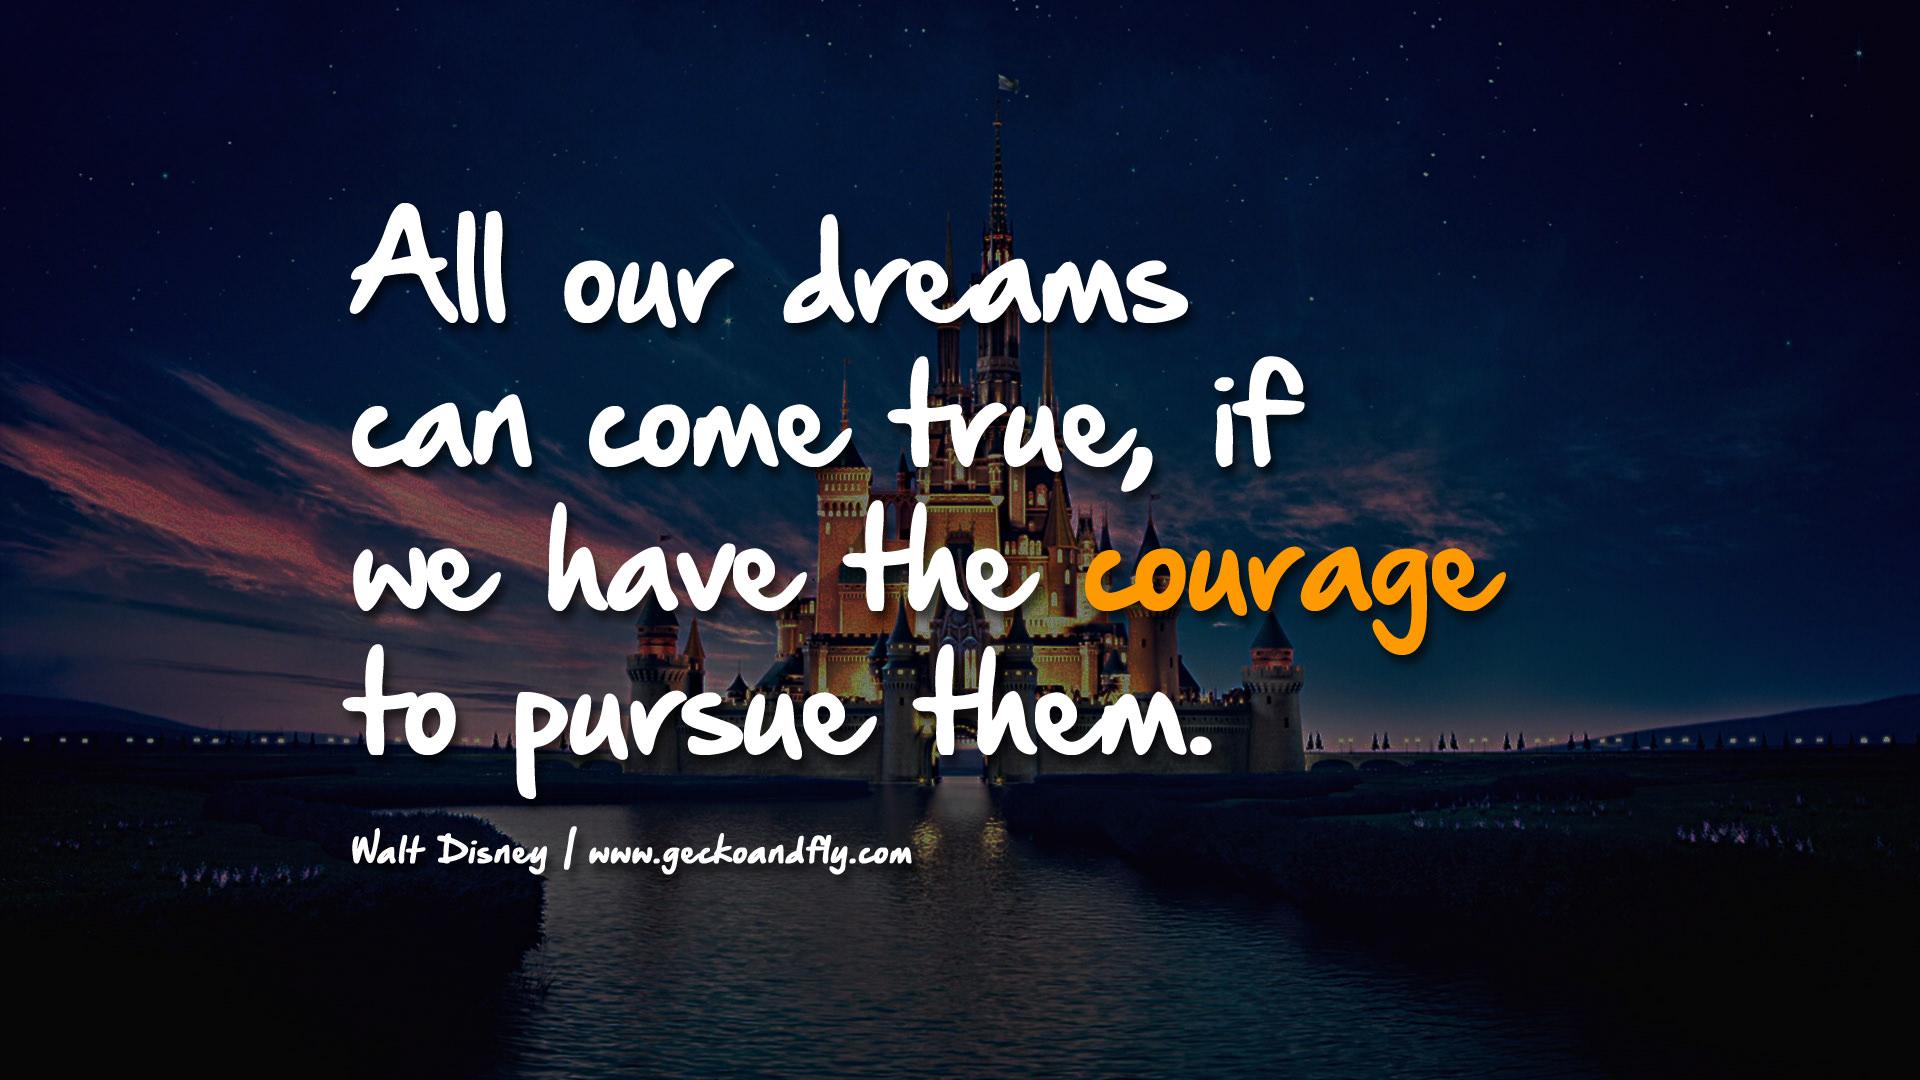 Disney Quotes: Disney Quotes About Courage. QuotesGram